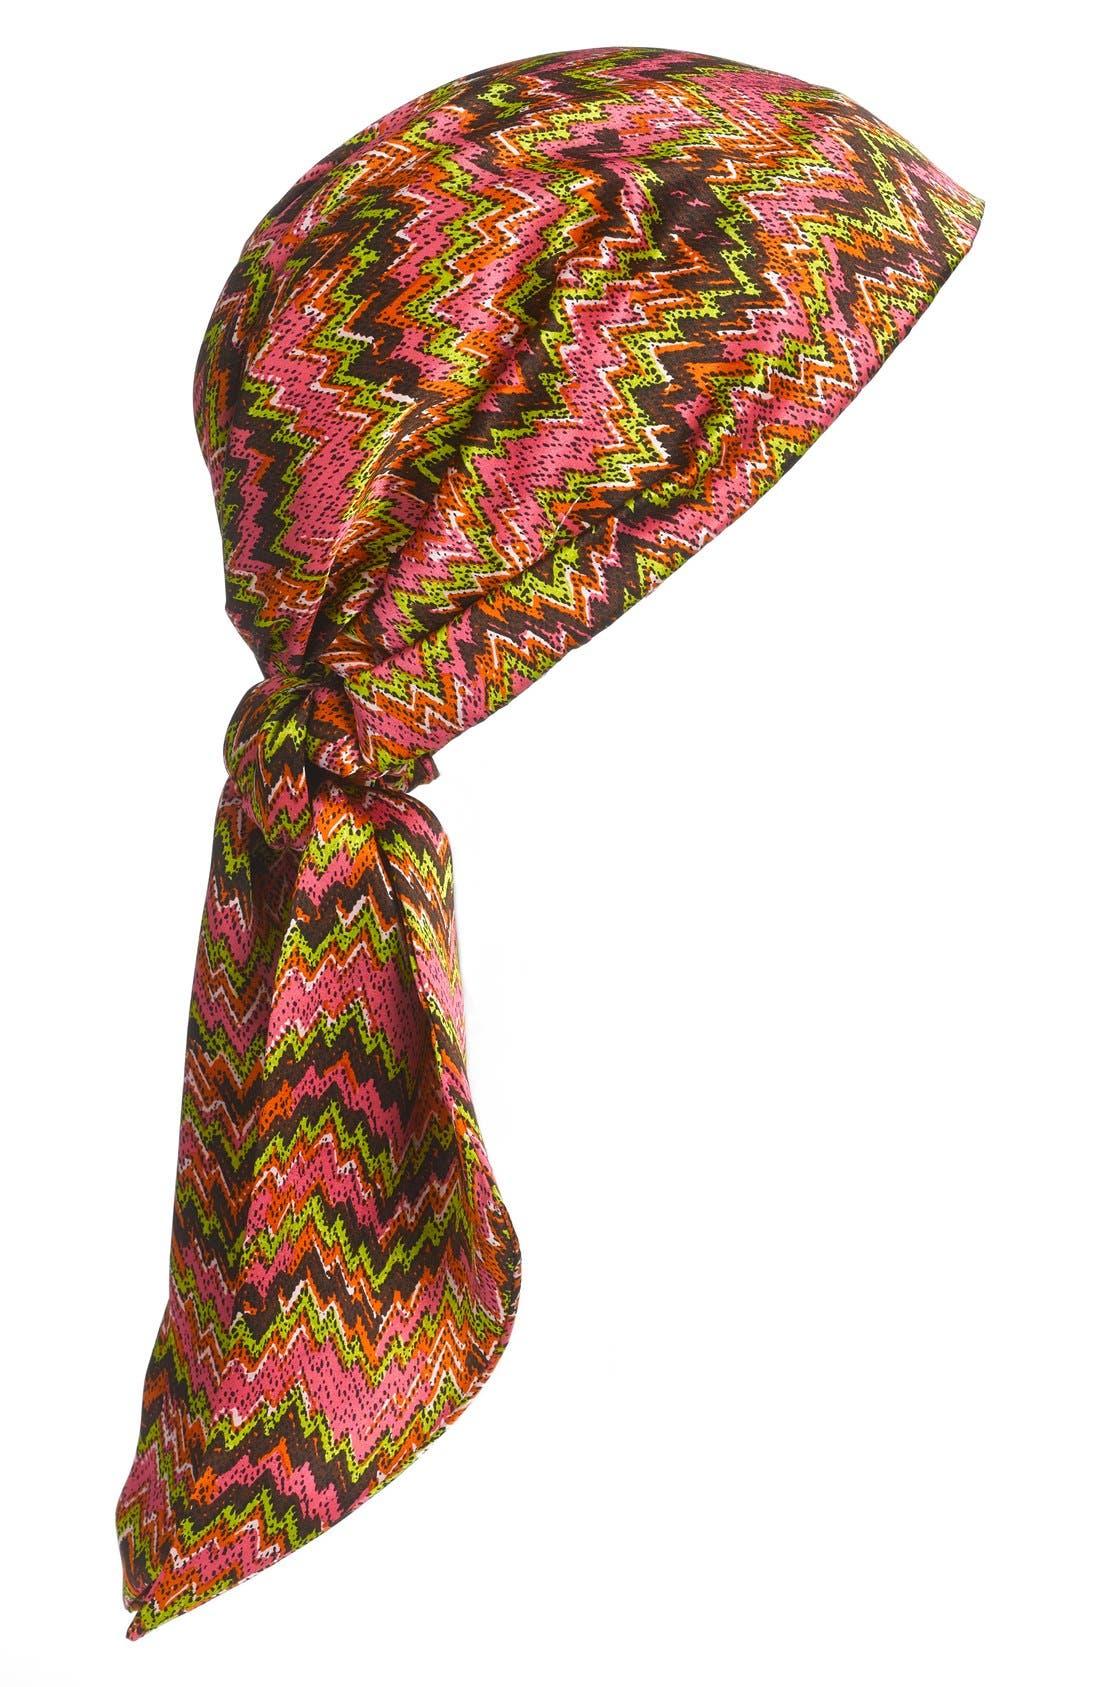 Alternate Image 1 Selected - L. Erickson 'It's a Wrap' Silk Head Wrap